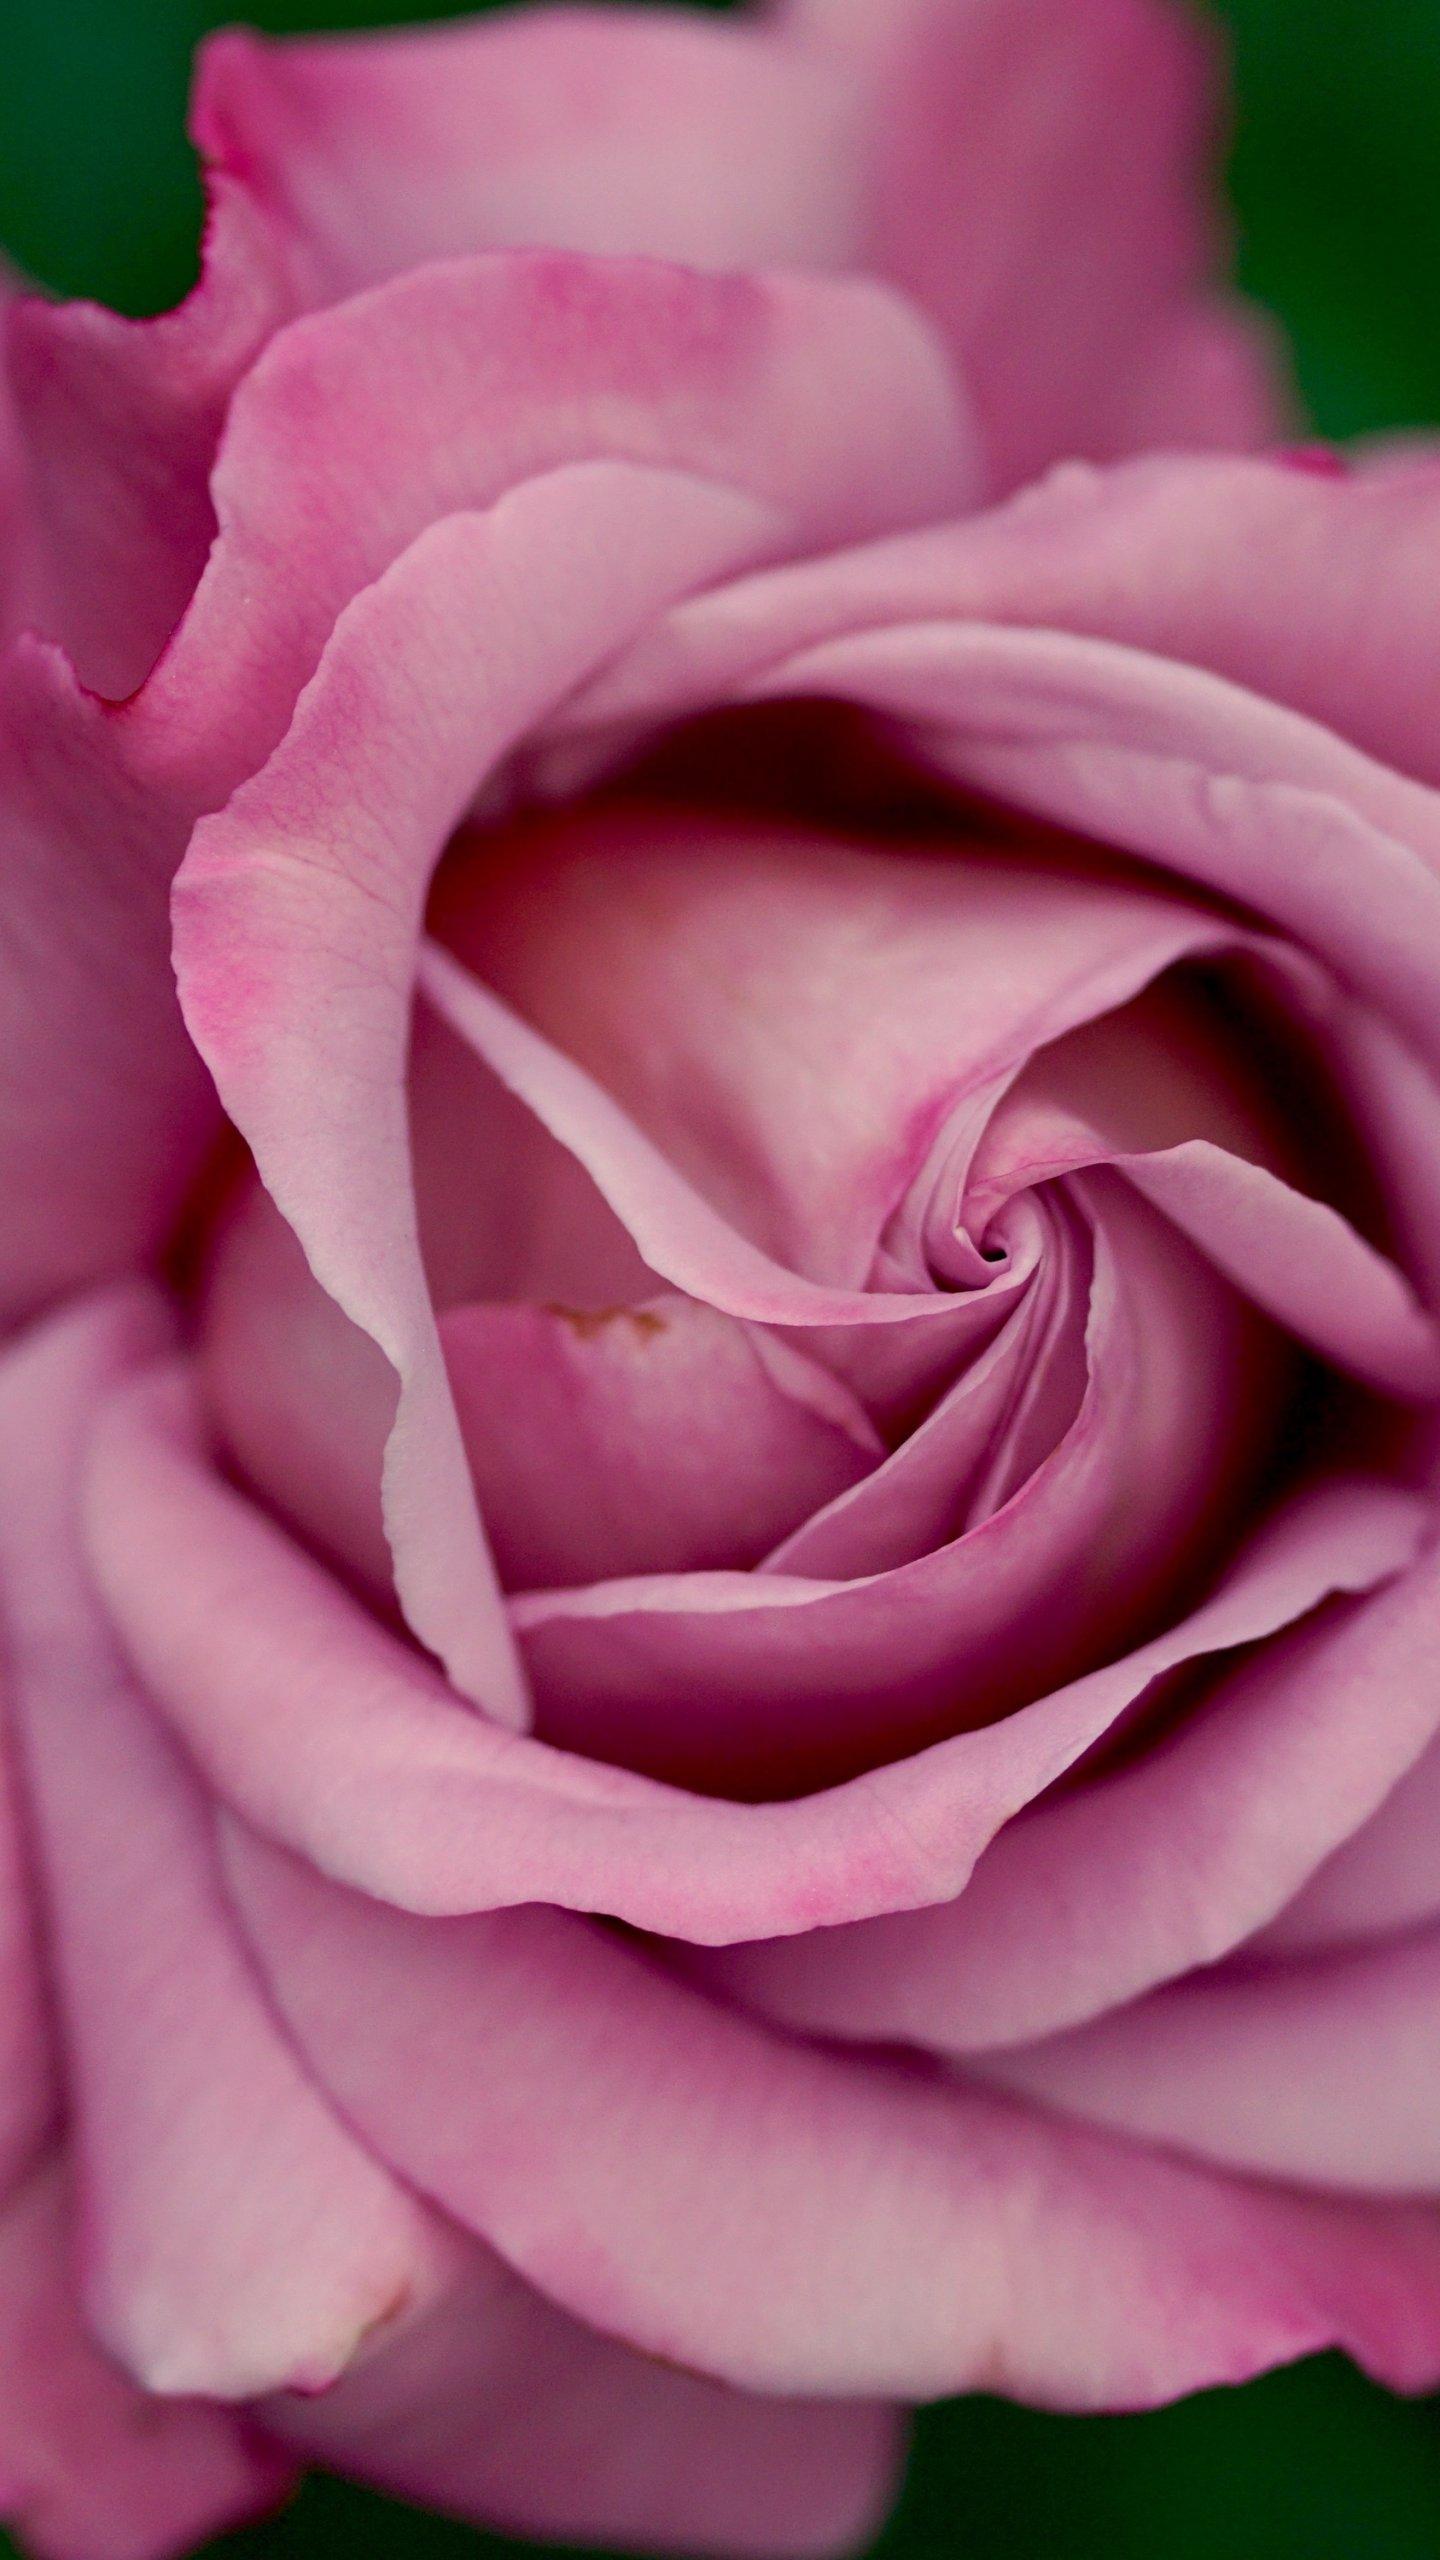 Dusty pink rose wallpaper mobile desktop background - Pink rose hd wallpaper ...